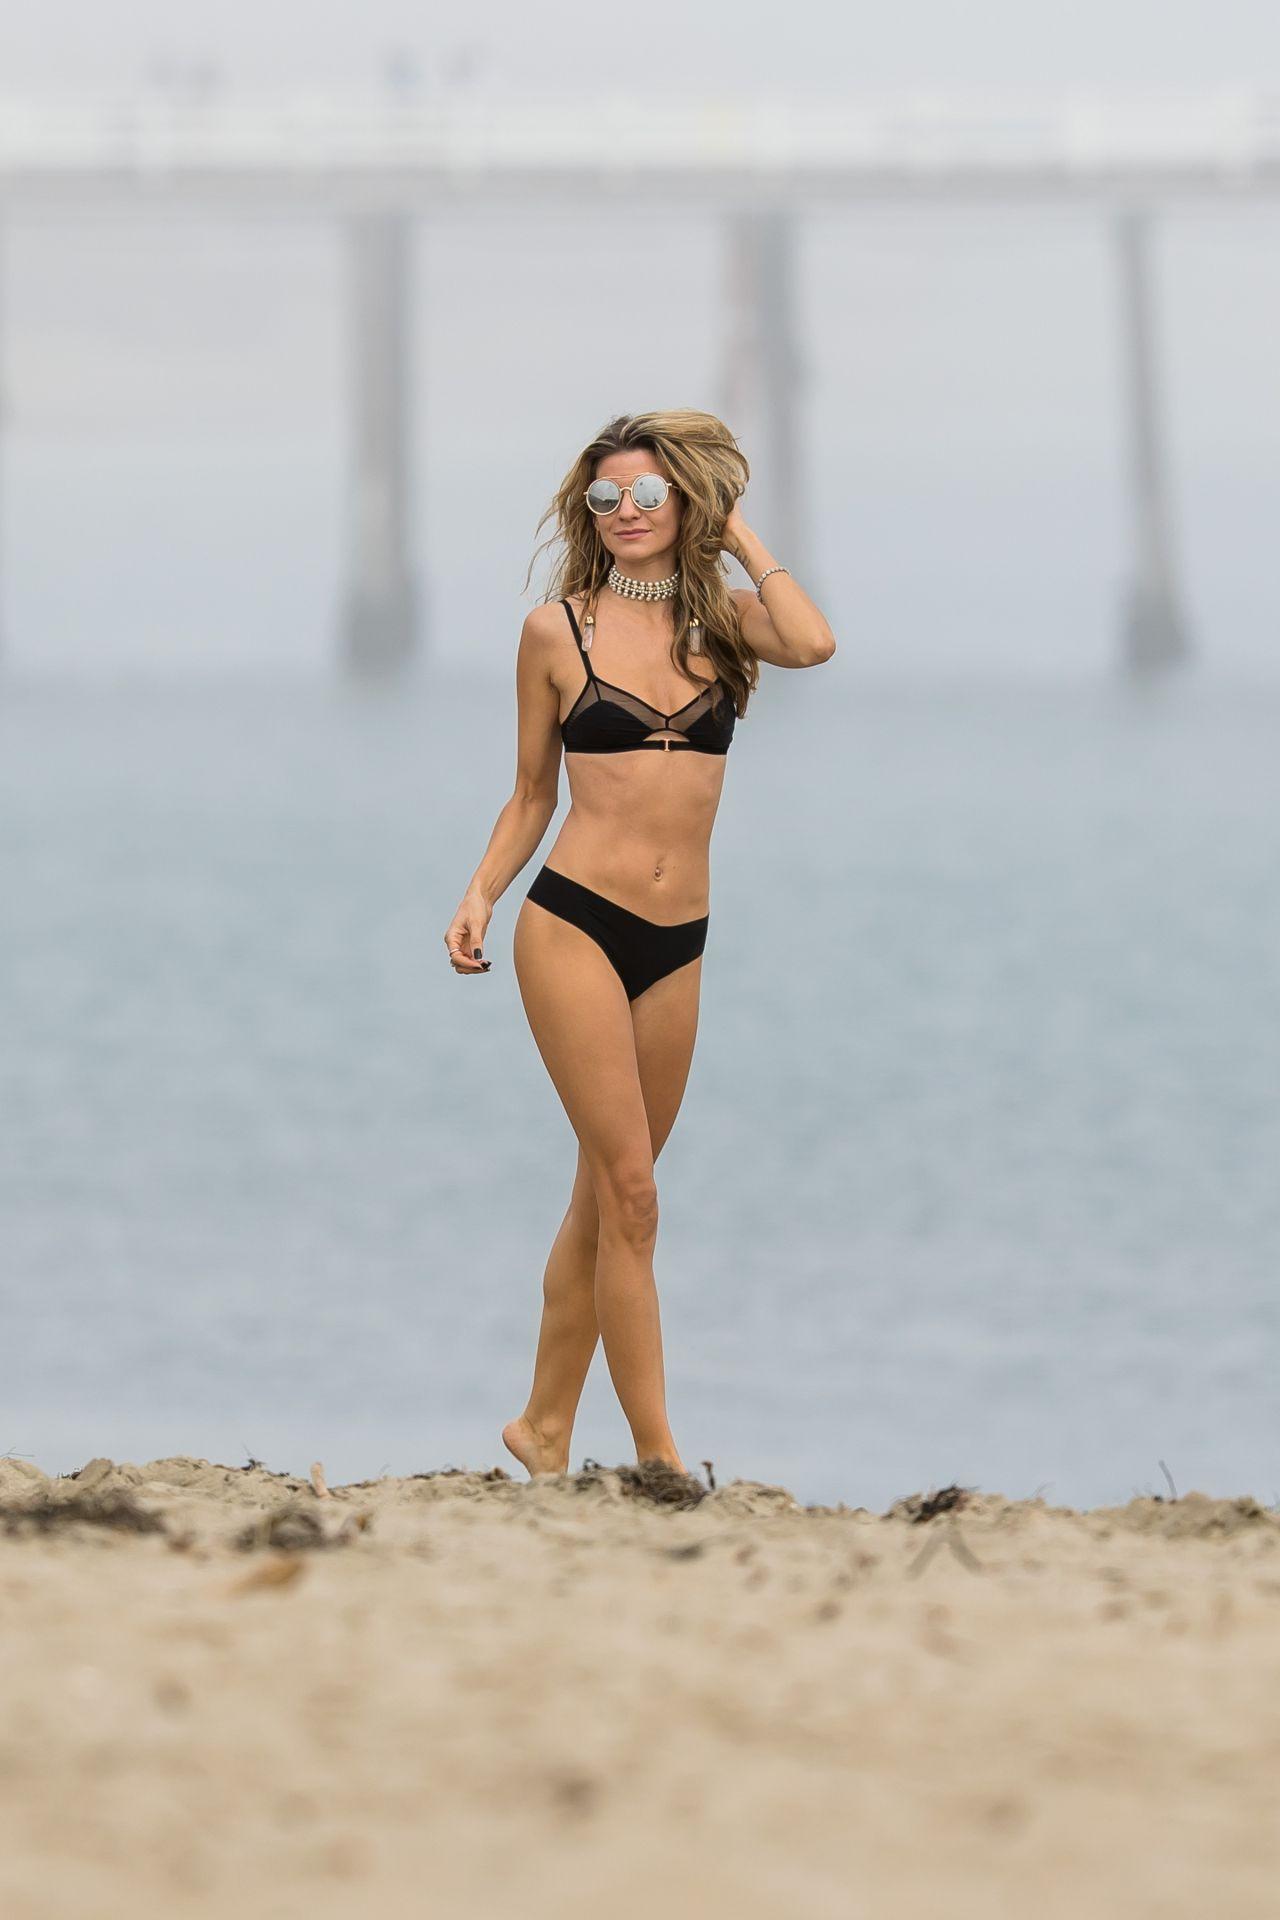 Rachel McCord in Black Bikini at a beach in Malibu Pic 8 of 35